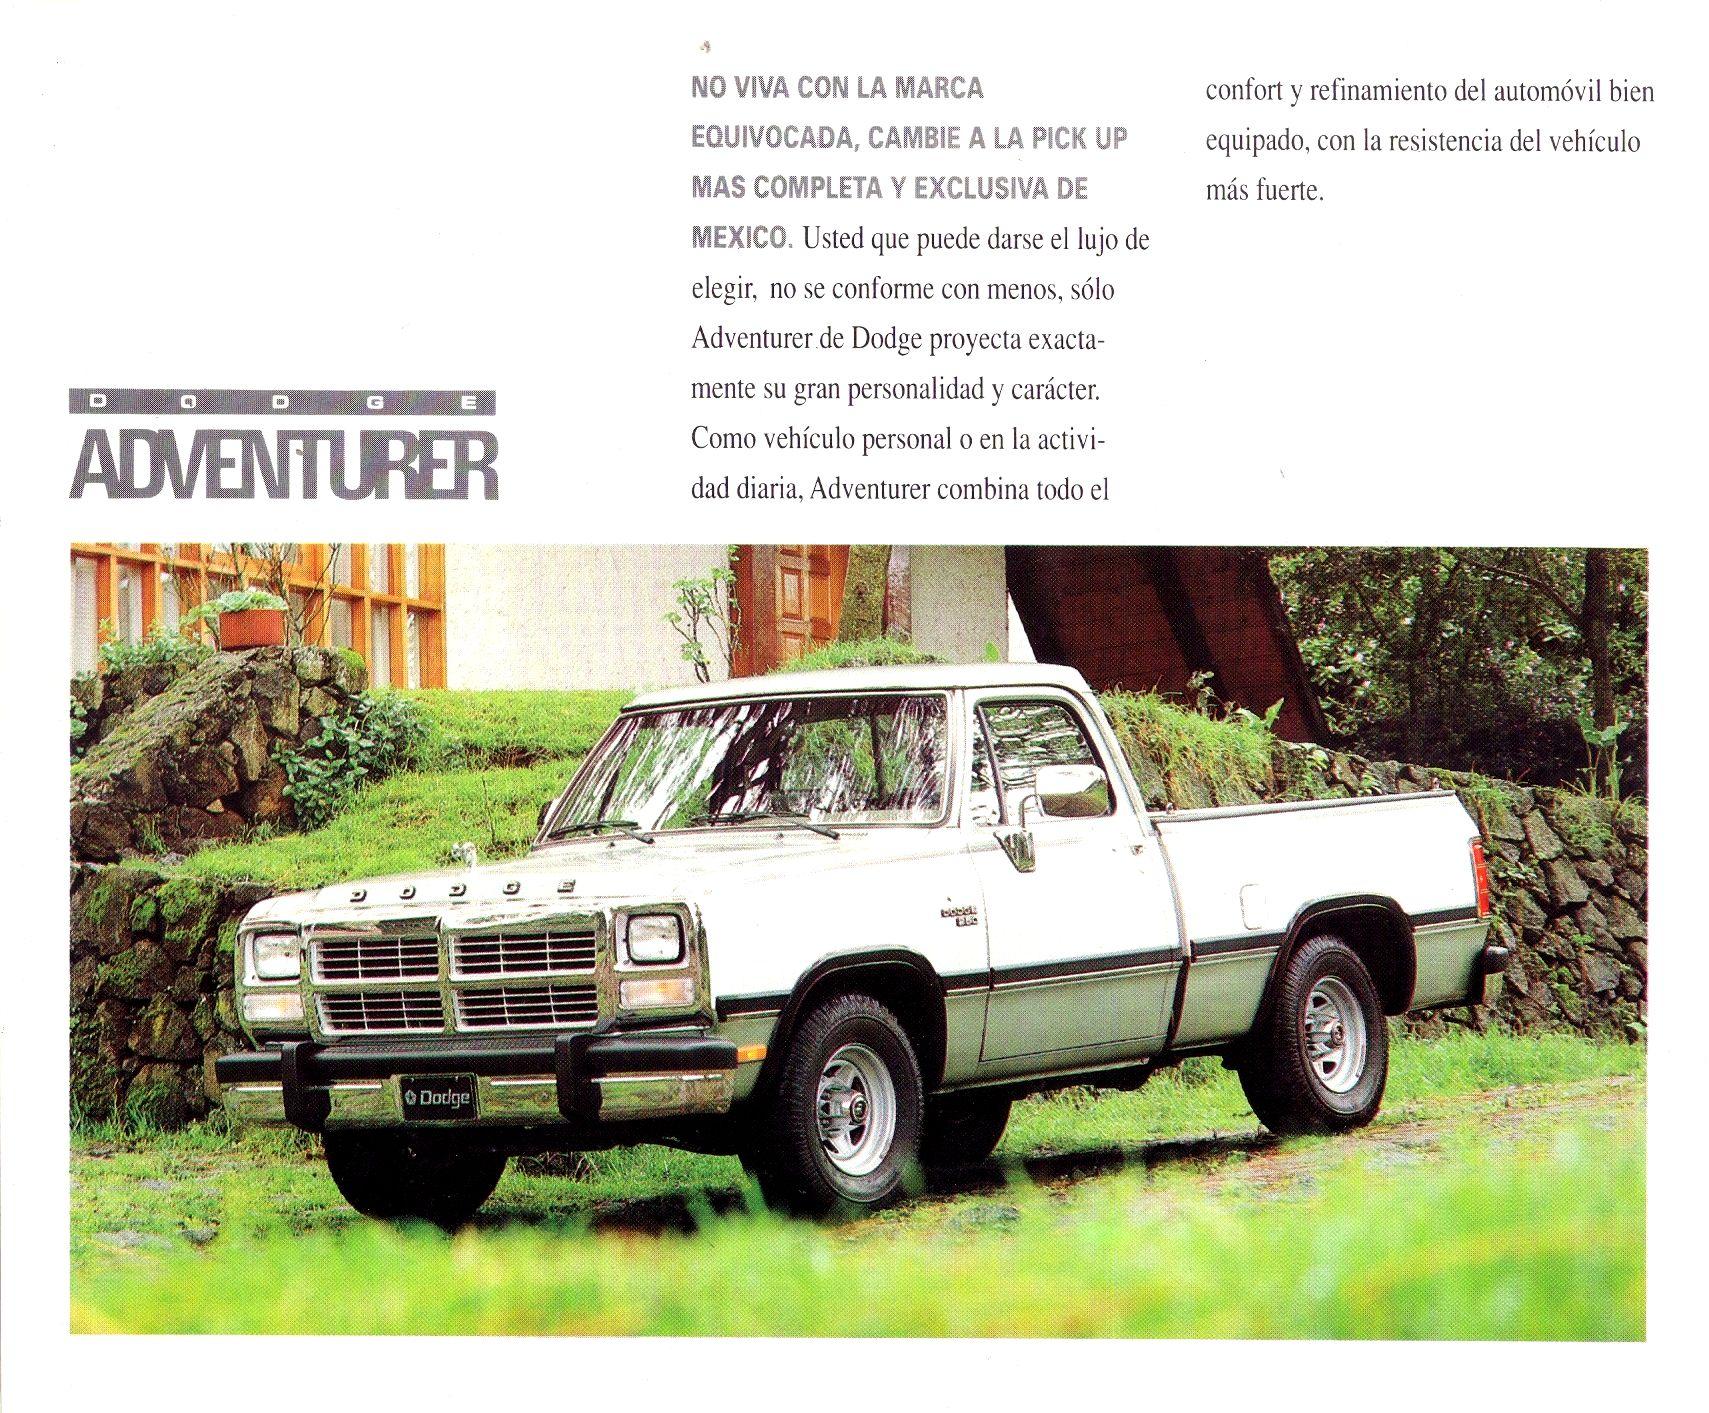 Old Dodge Car New Models 2019 2020 2012 Ram 1500 Brochure 1991 Trucks